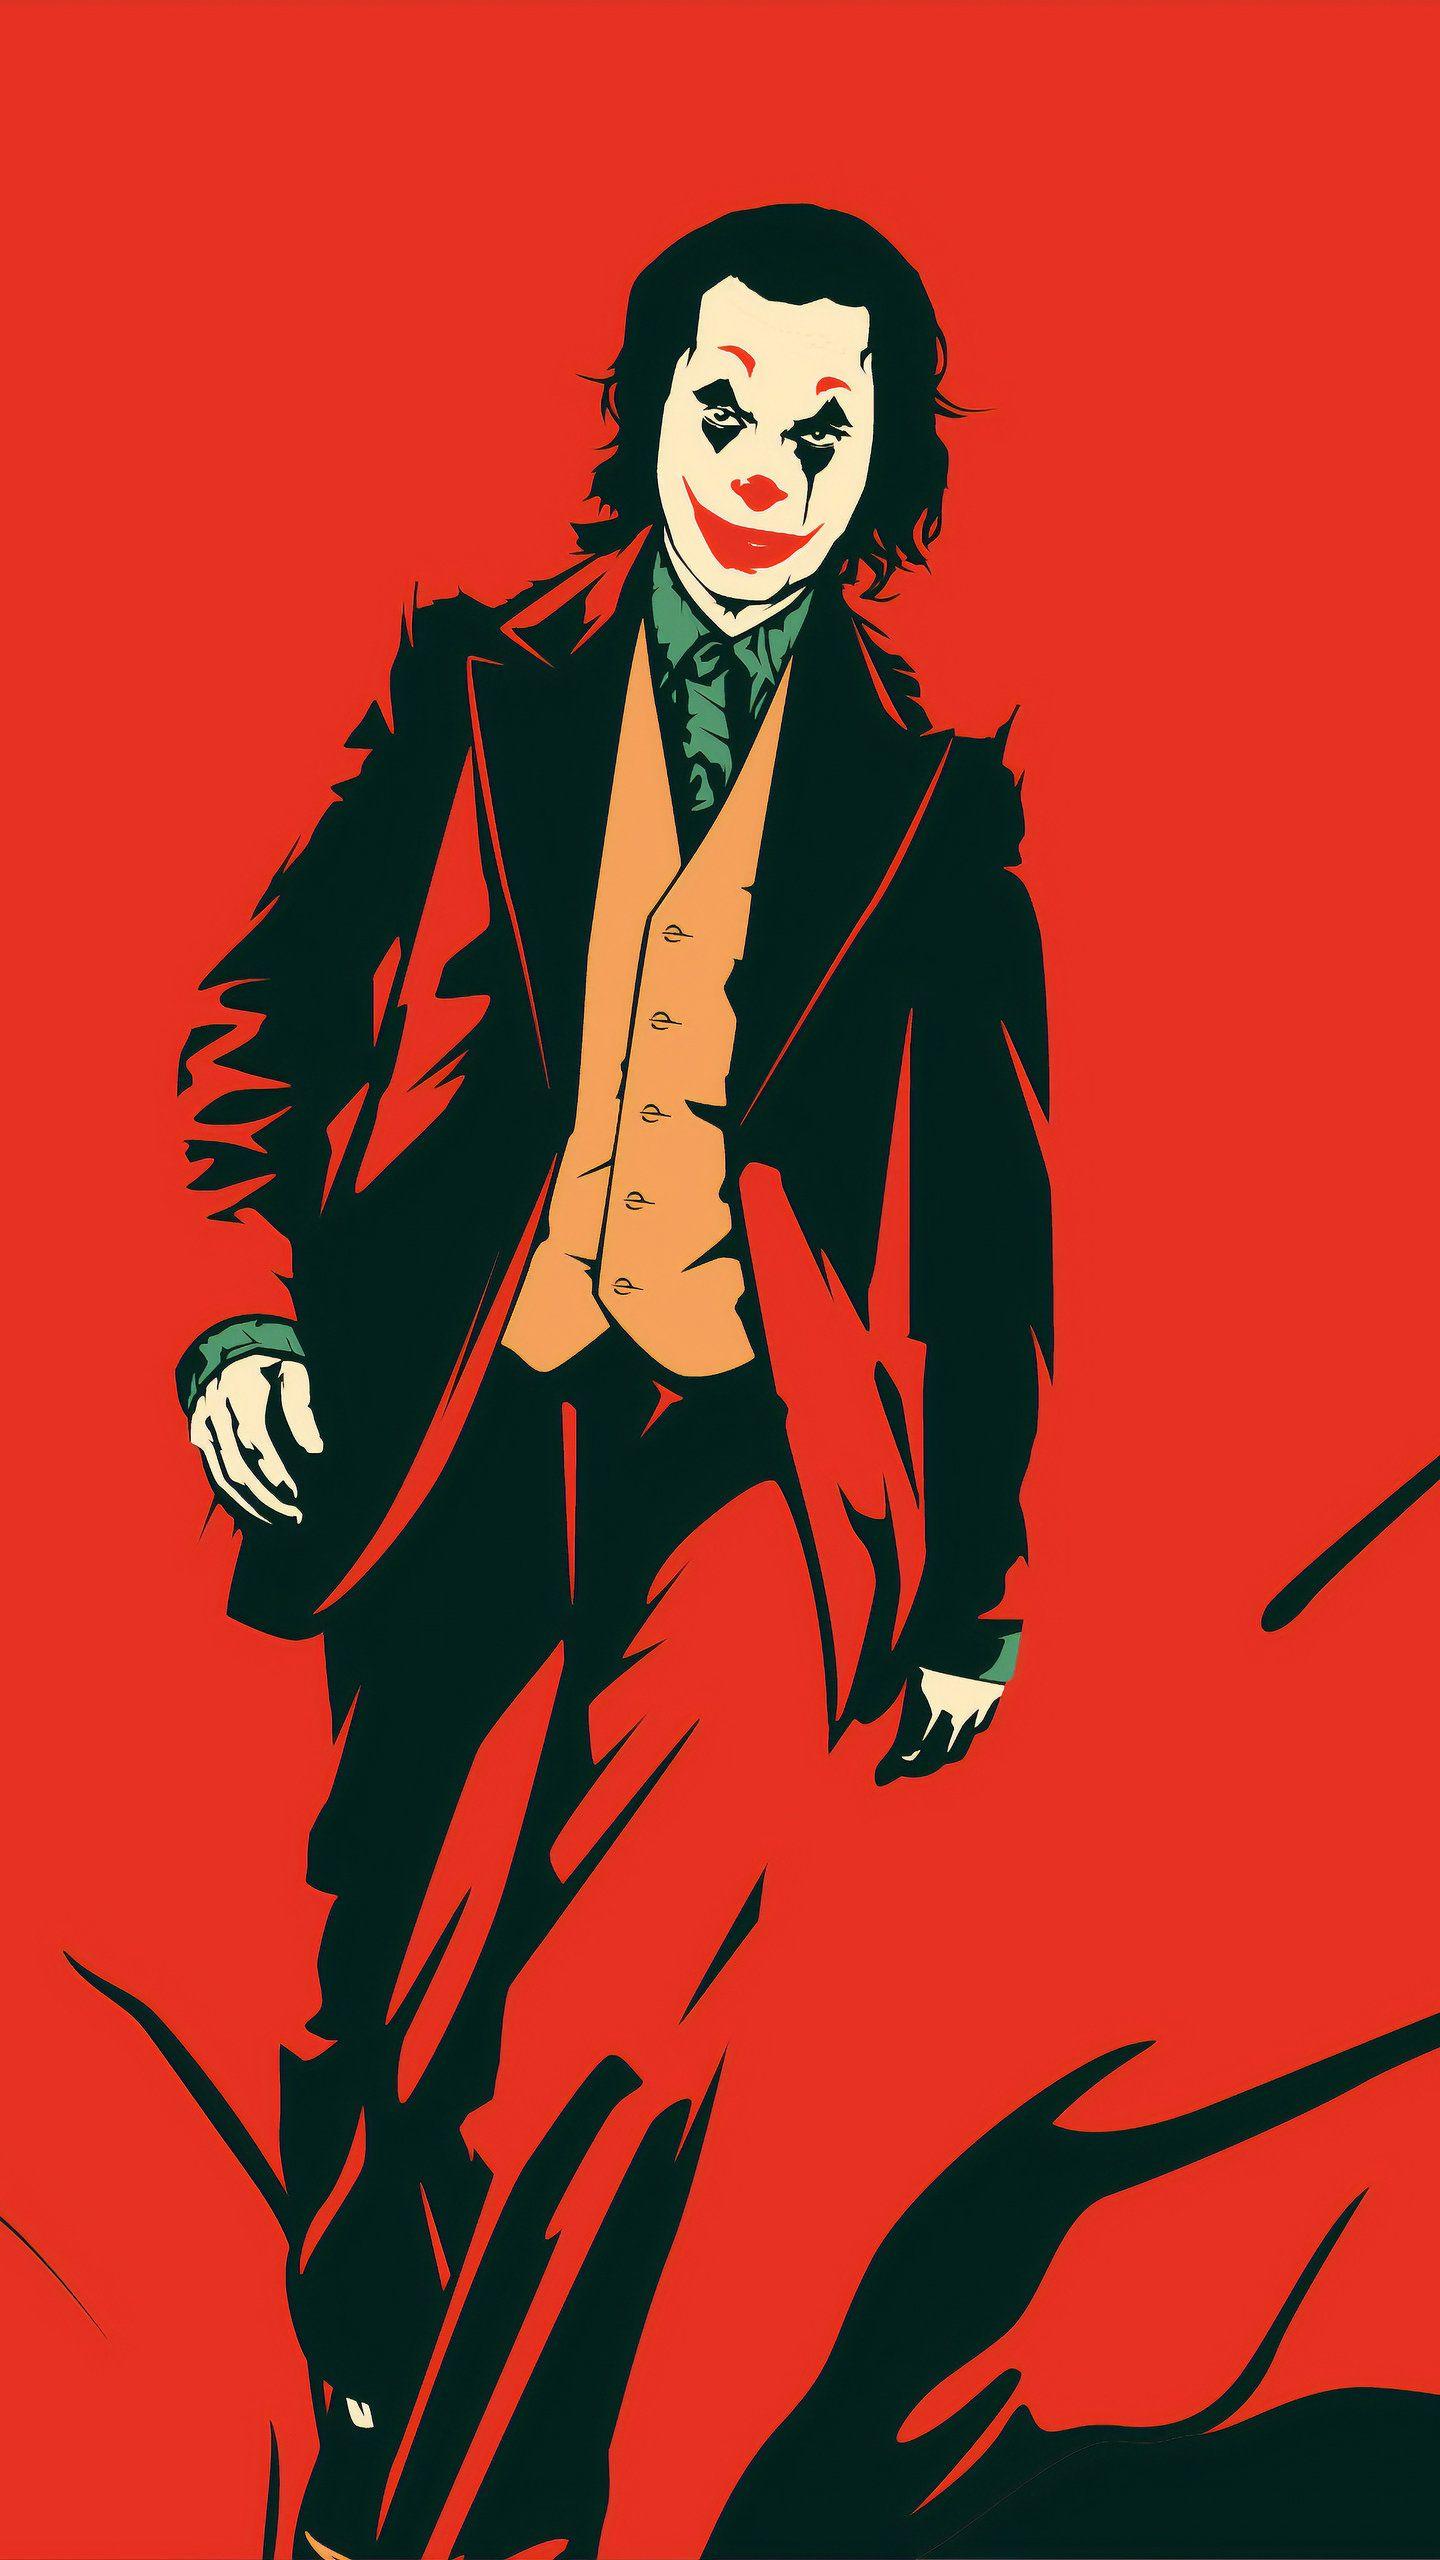 Joker Red 4K HD Wallpaper (1440x2560) | Joker wallpapers ...